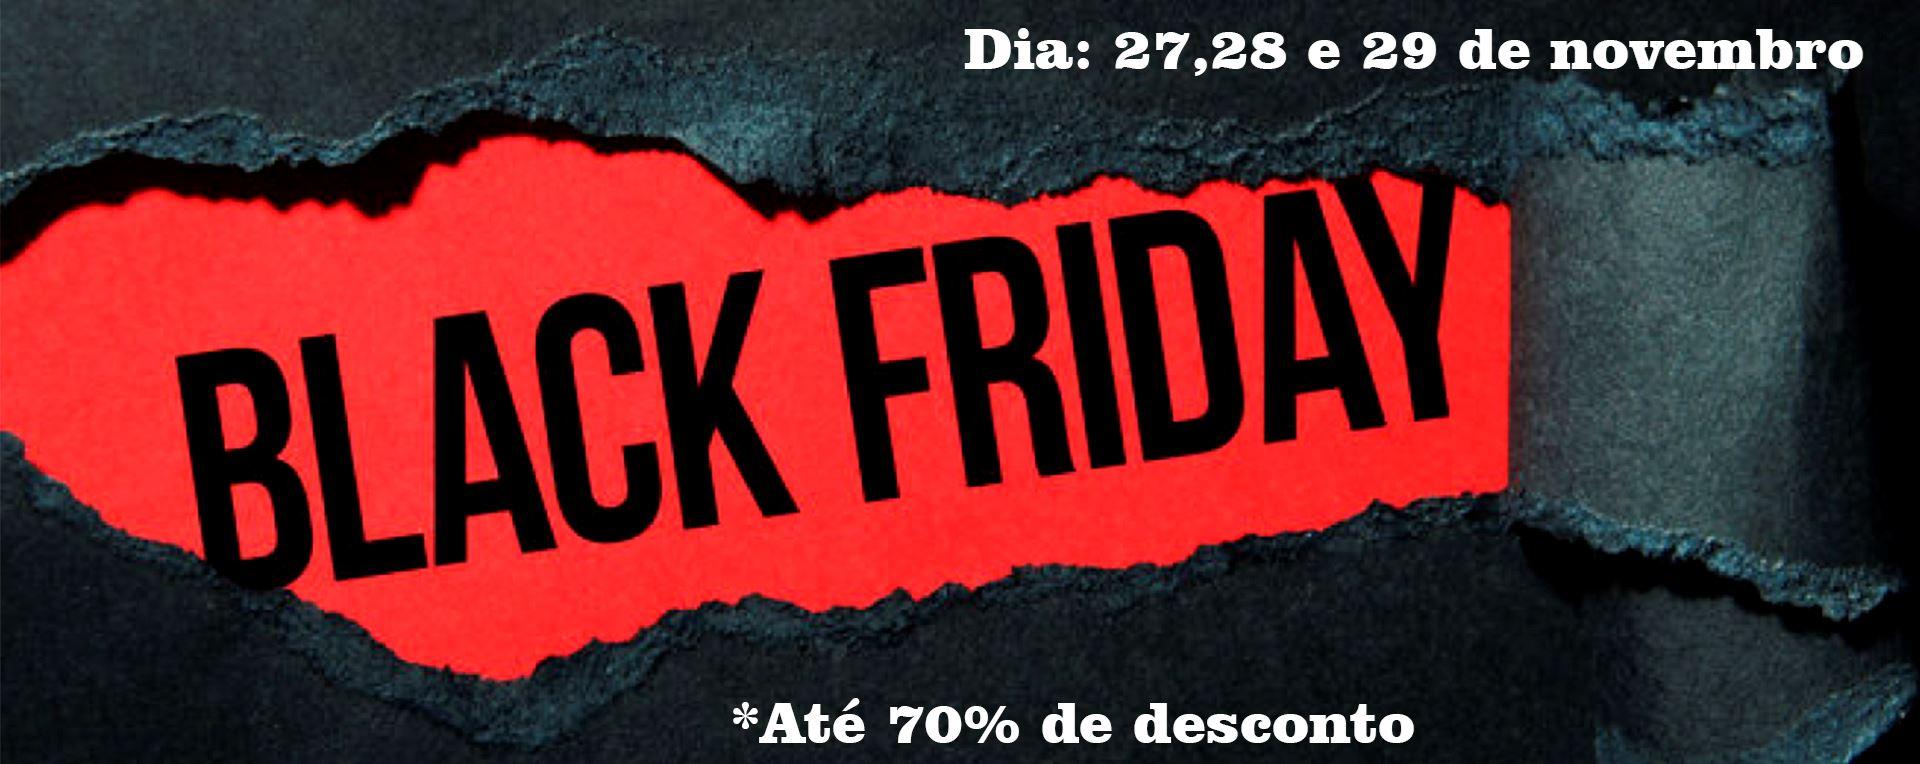 https://www.statussemijoias.com.br/producttag/26/blackfriday